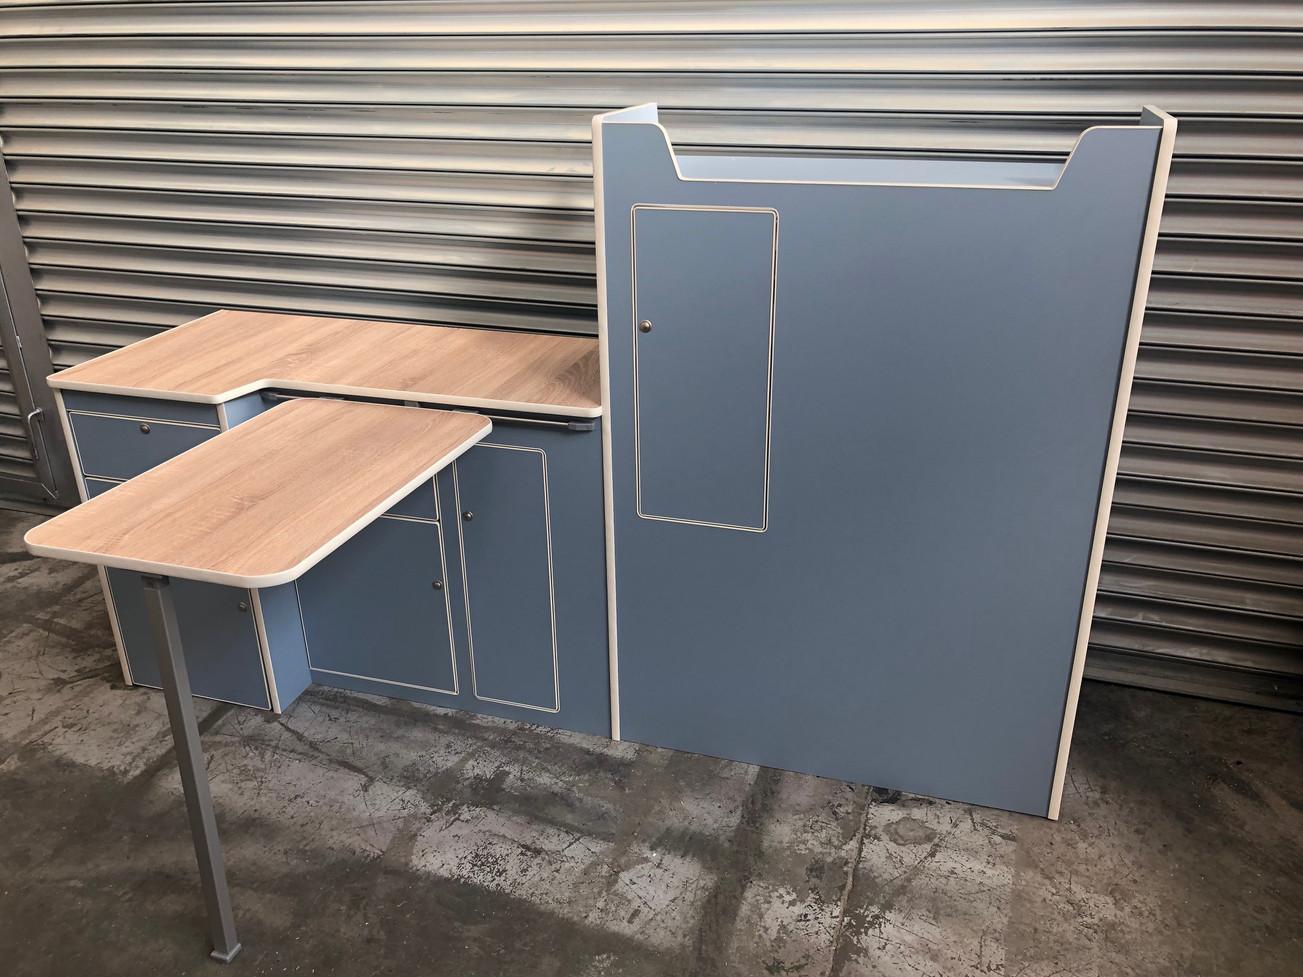 SWB with fridge door